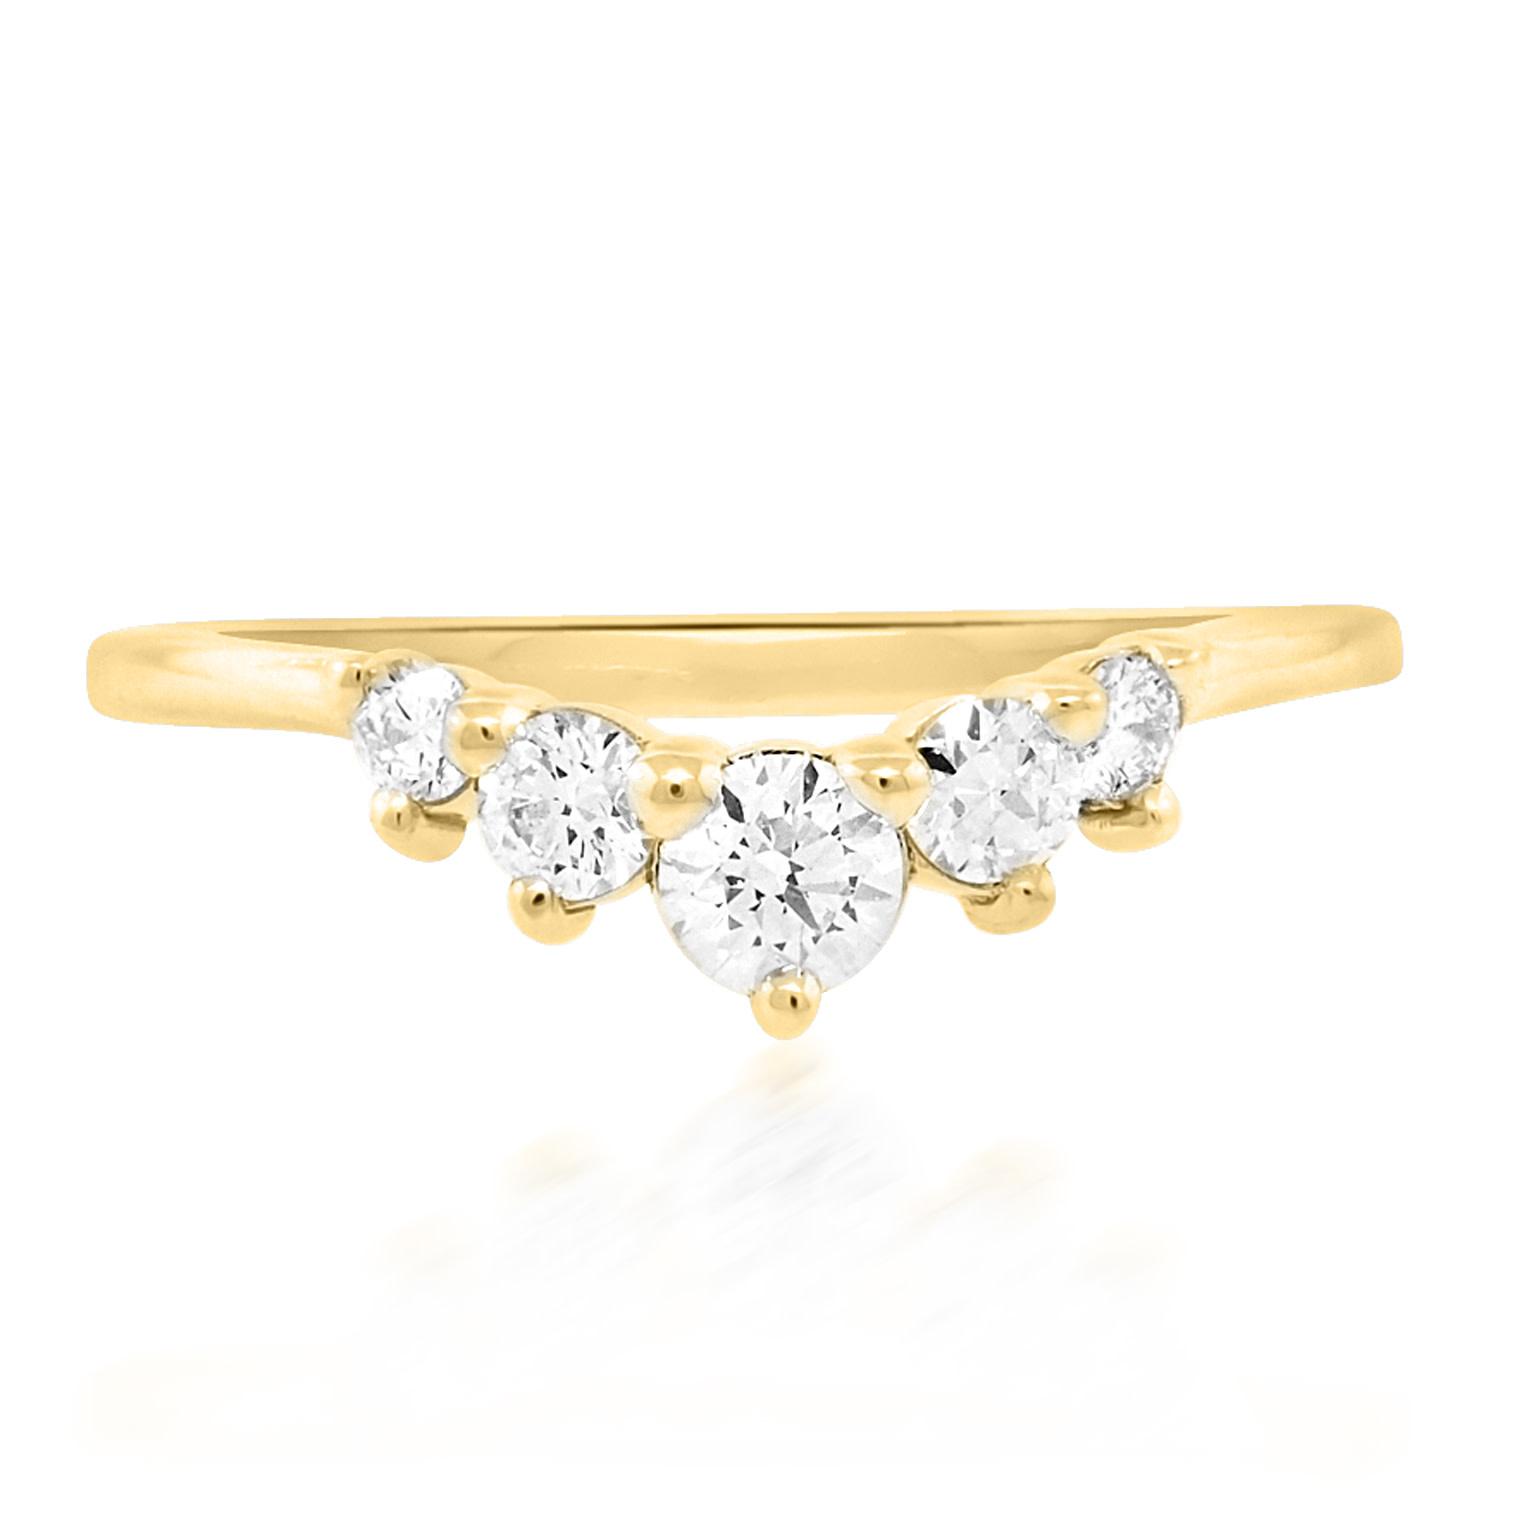 Trabert Goldsmiths Medium Curved Chevron Diamond Ring